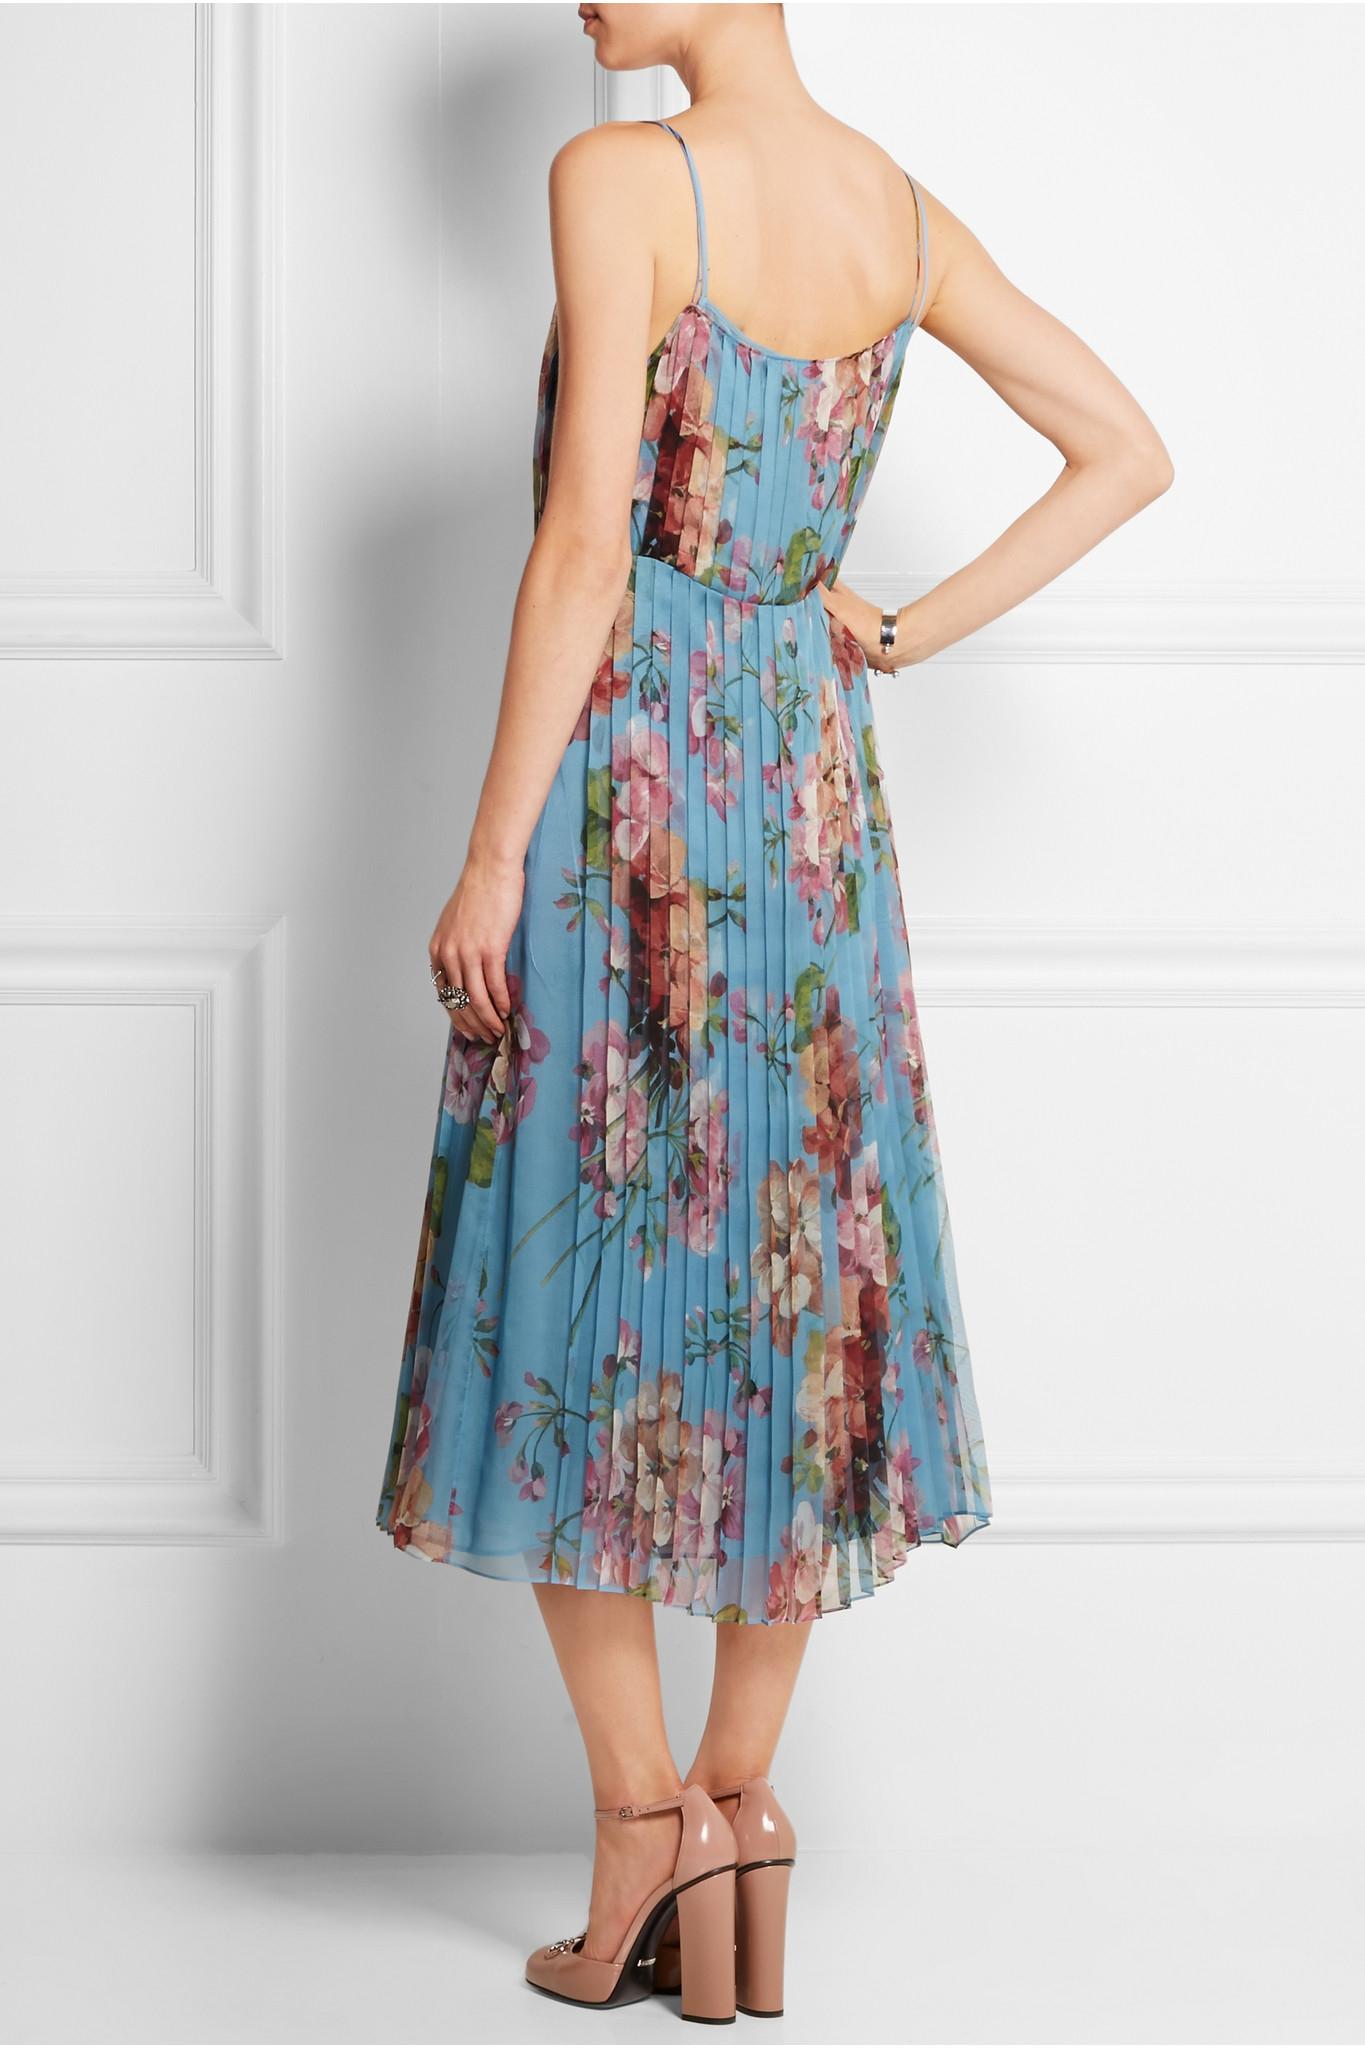 Lyst - Gucci Pleated Floral-print Stretch-silk Dress in Blue